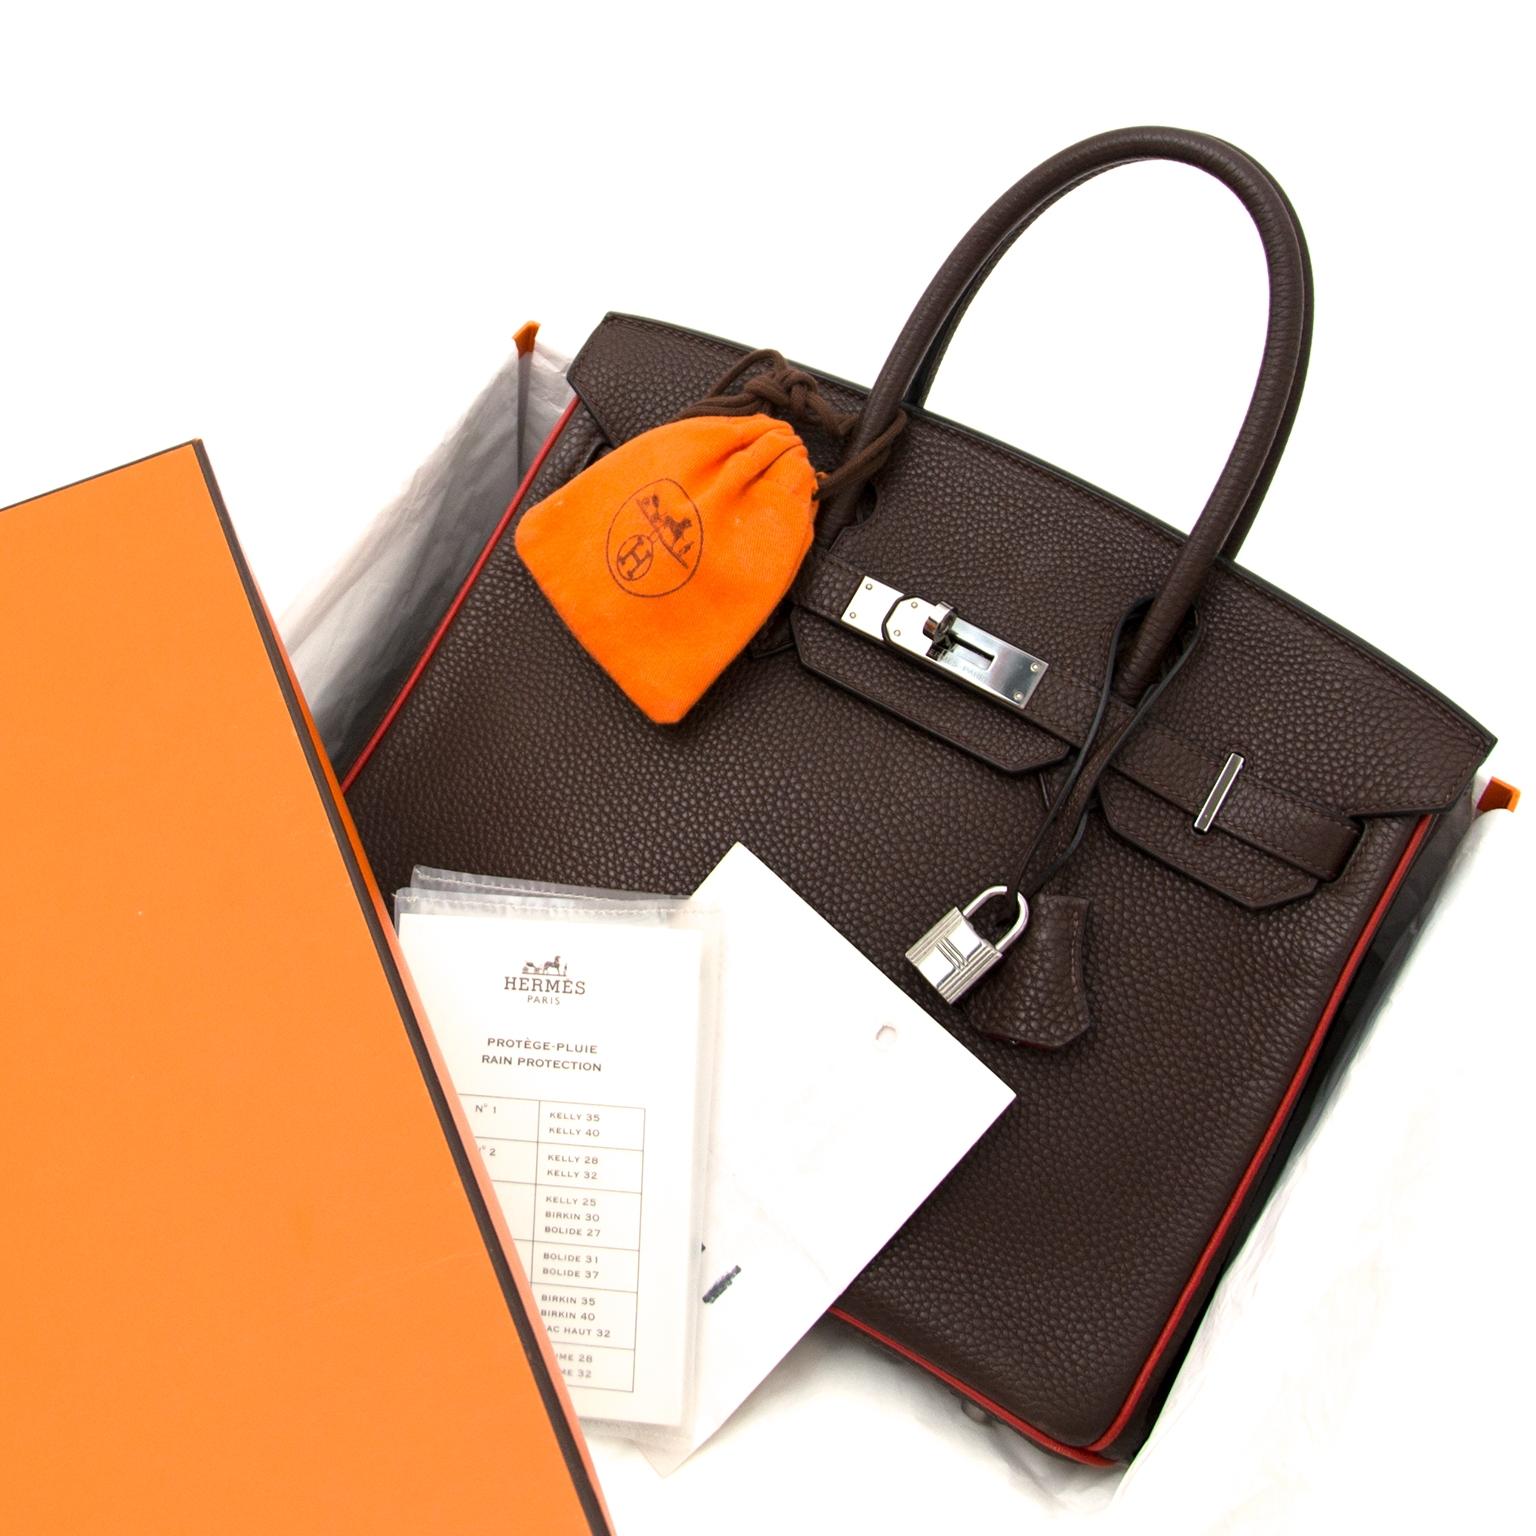 3d9b76ed99 ... acheter en ligne chez labellov.com Hermès Birkin 30 Togo Doublure chevre  pigmente